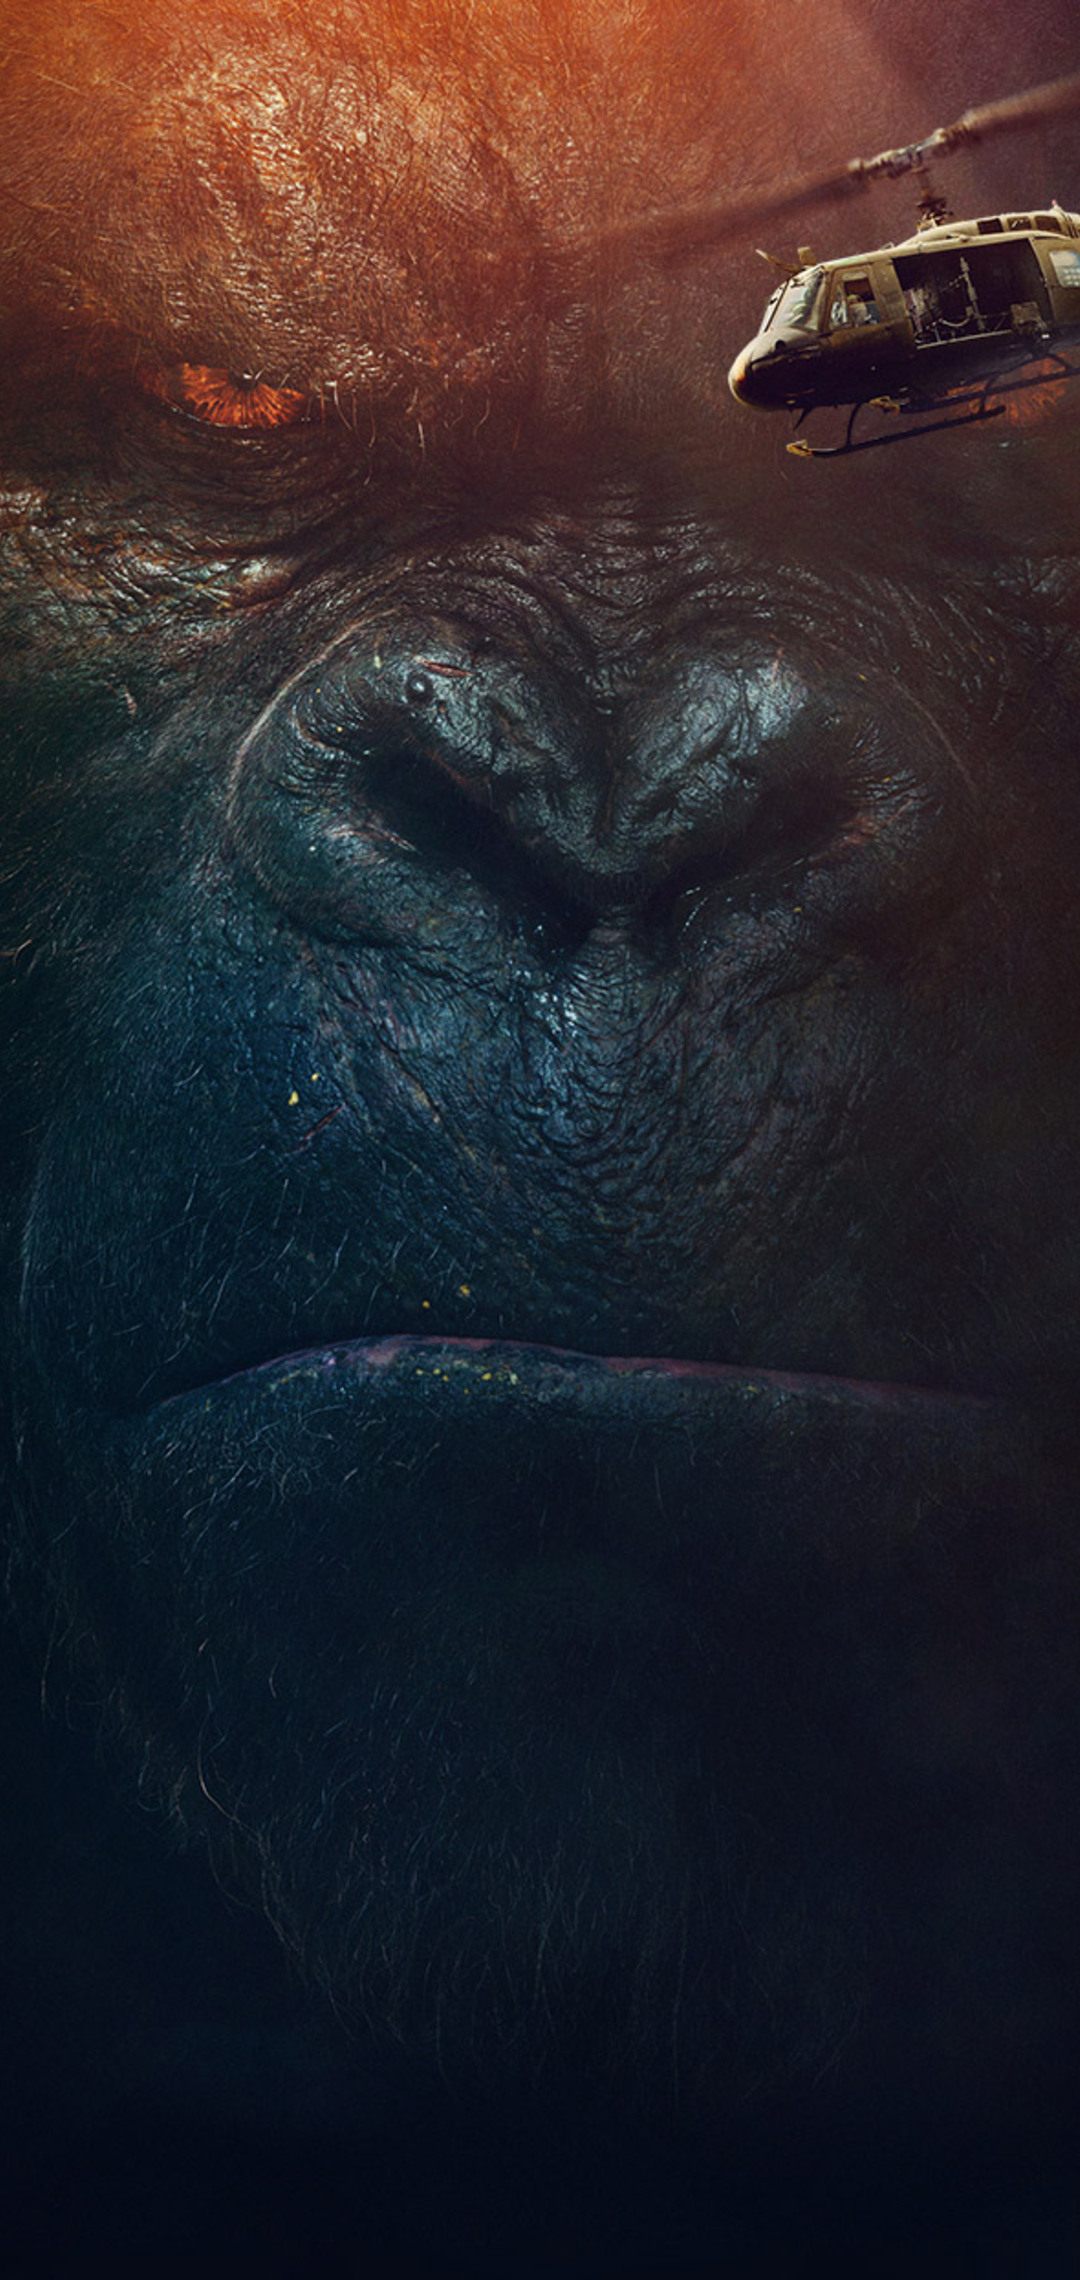 kong-skull-island-2017-movie-ap.jpg